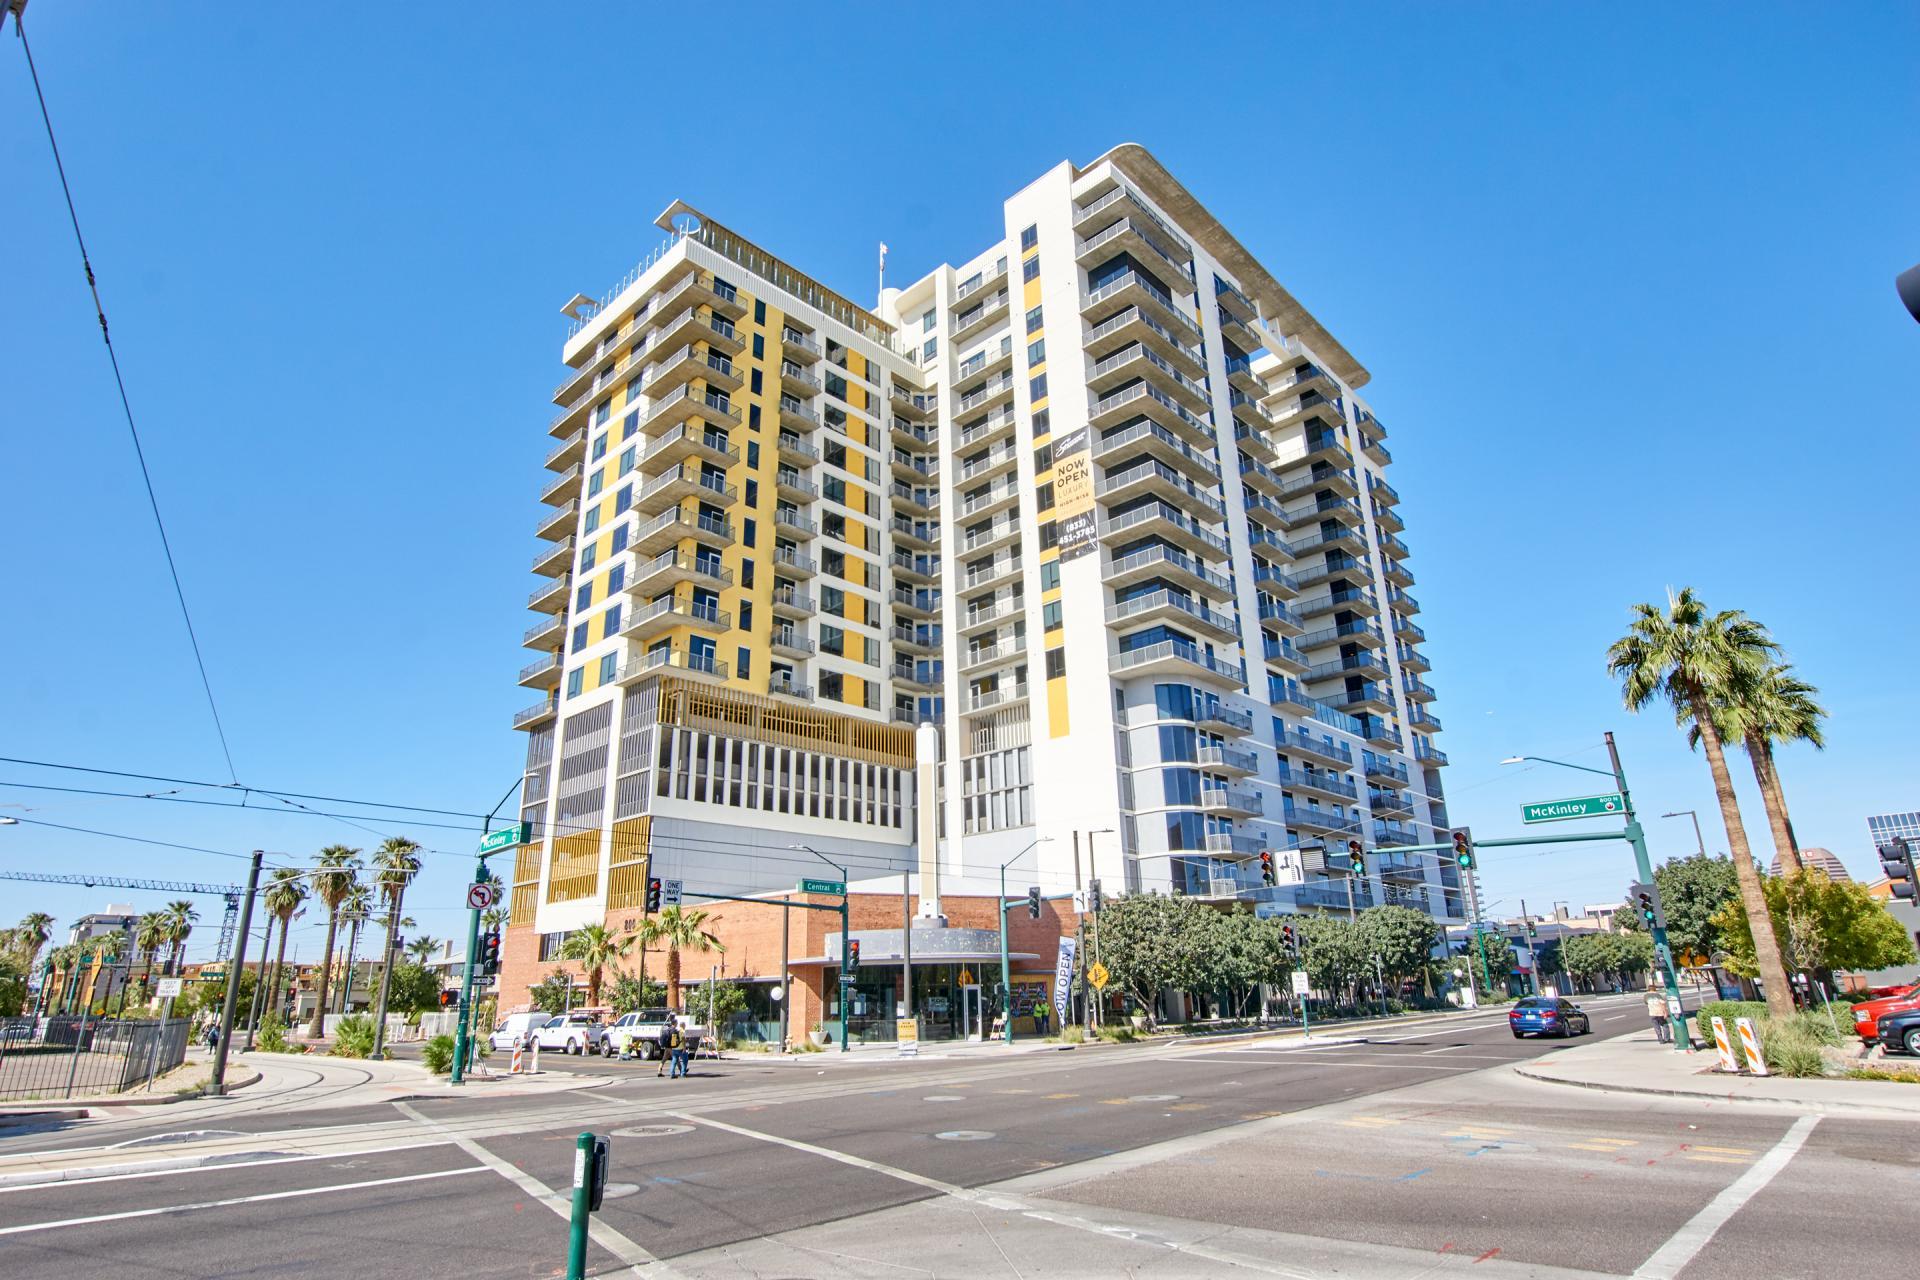 Exterior of McKinley Apartments, Center, Phoenix